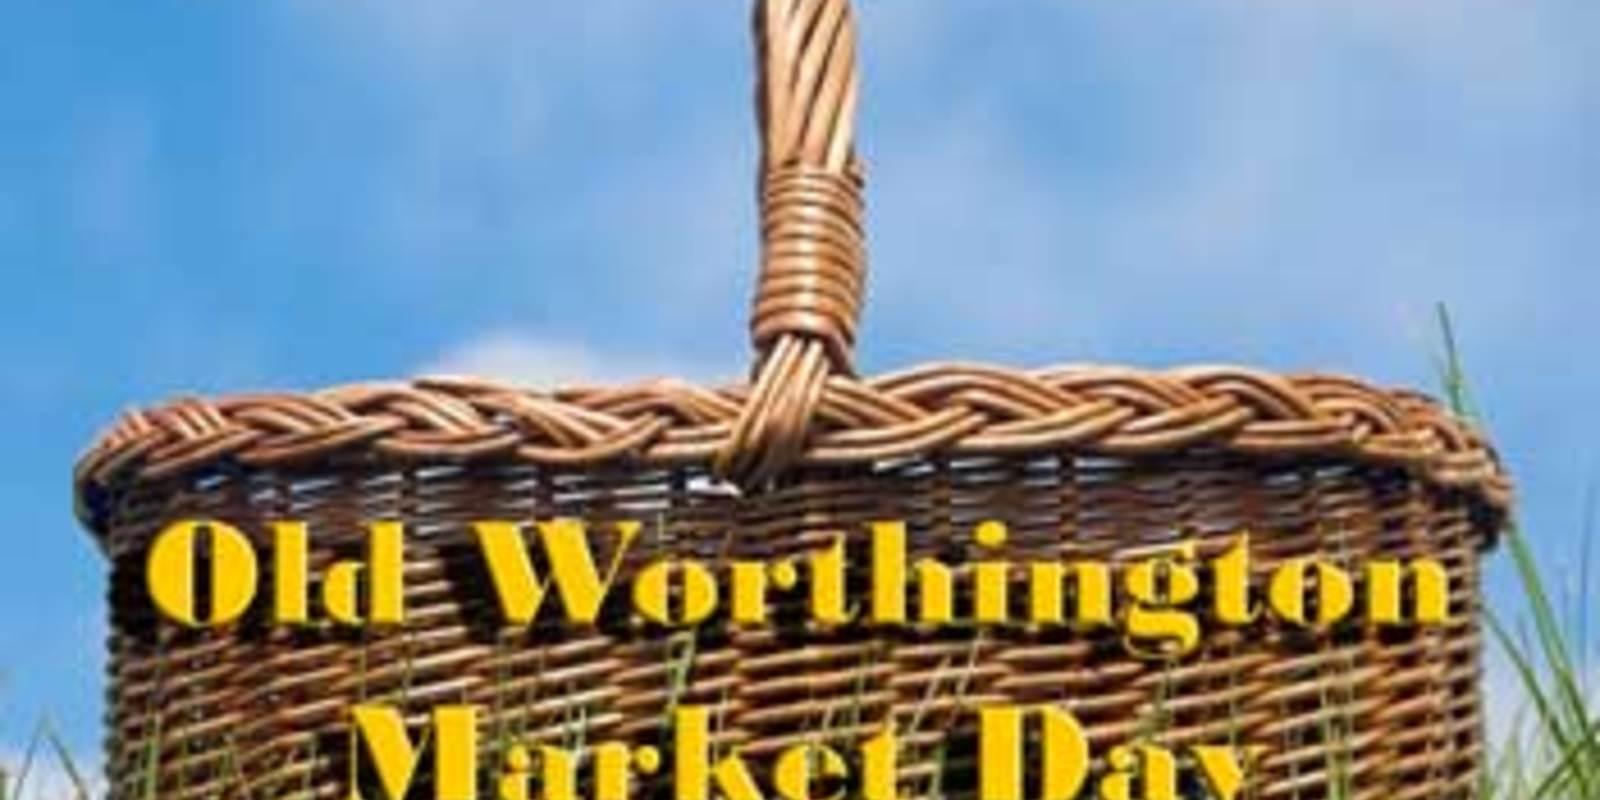 Old Worthington Market Day 2019 | ColumbusMakesArt com